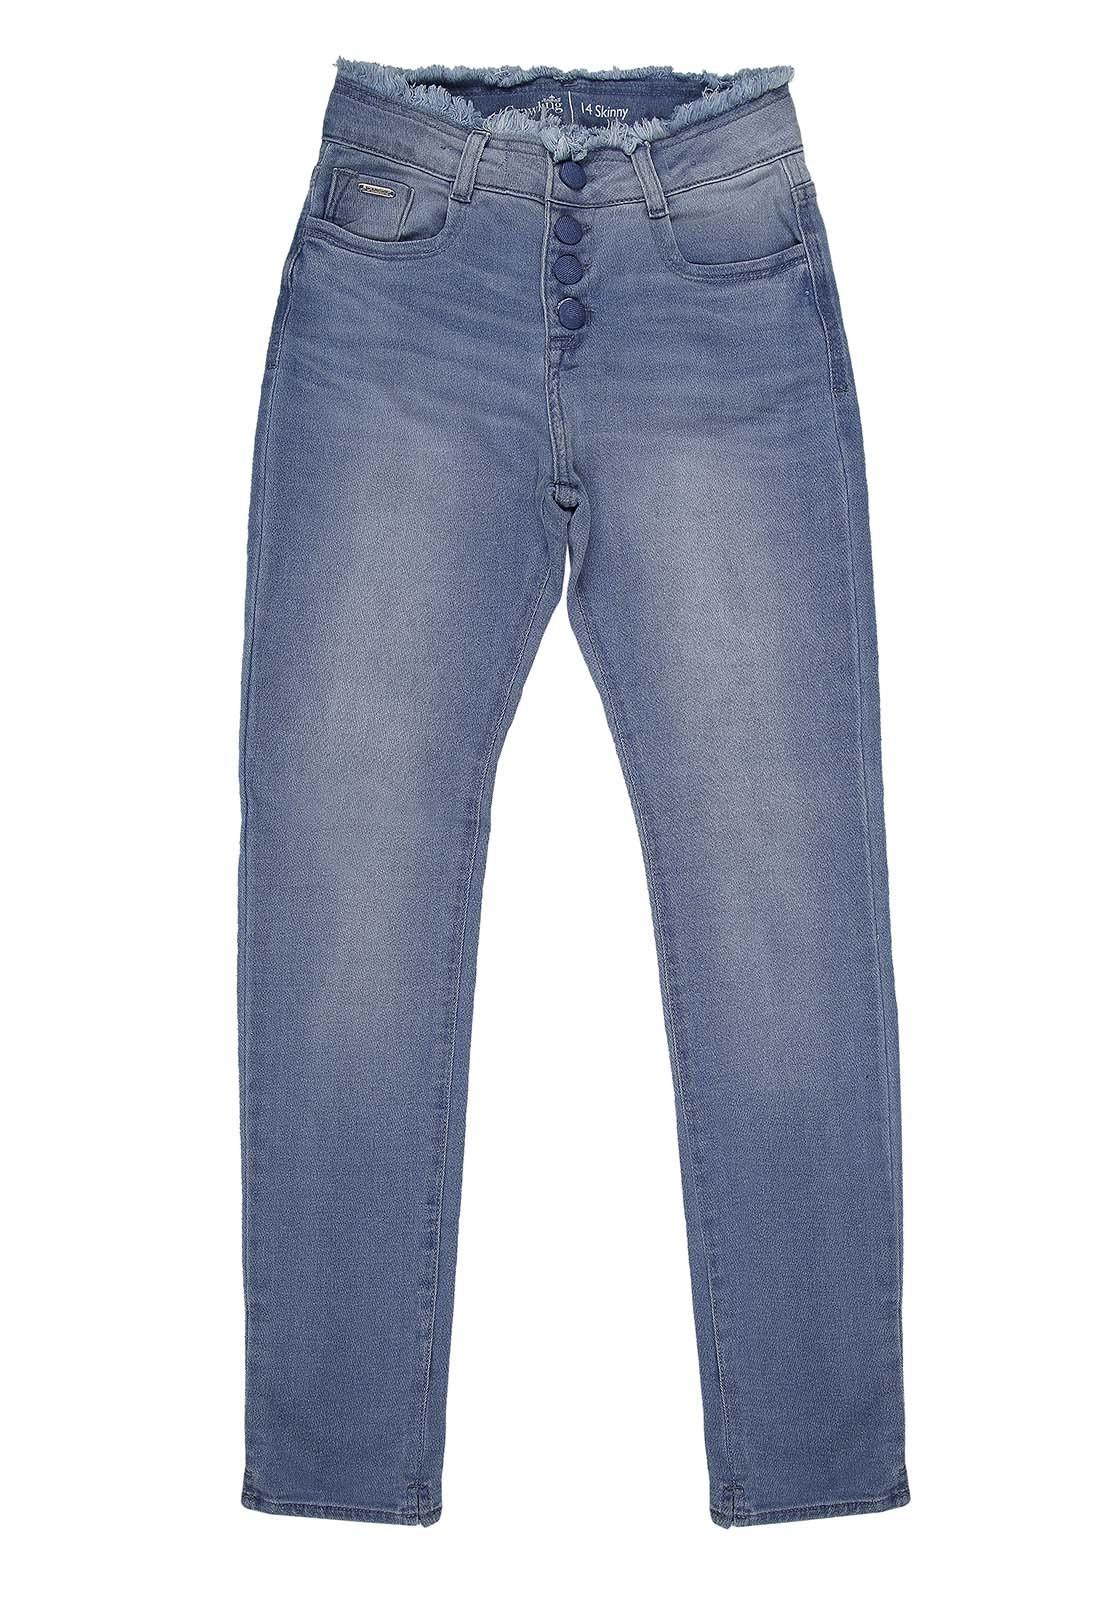 Calça Crawling Jeans Feminina